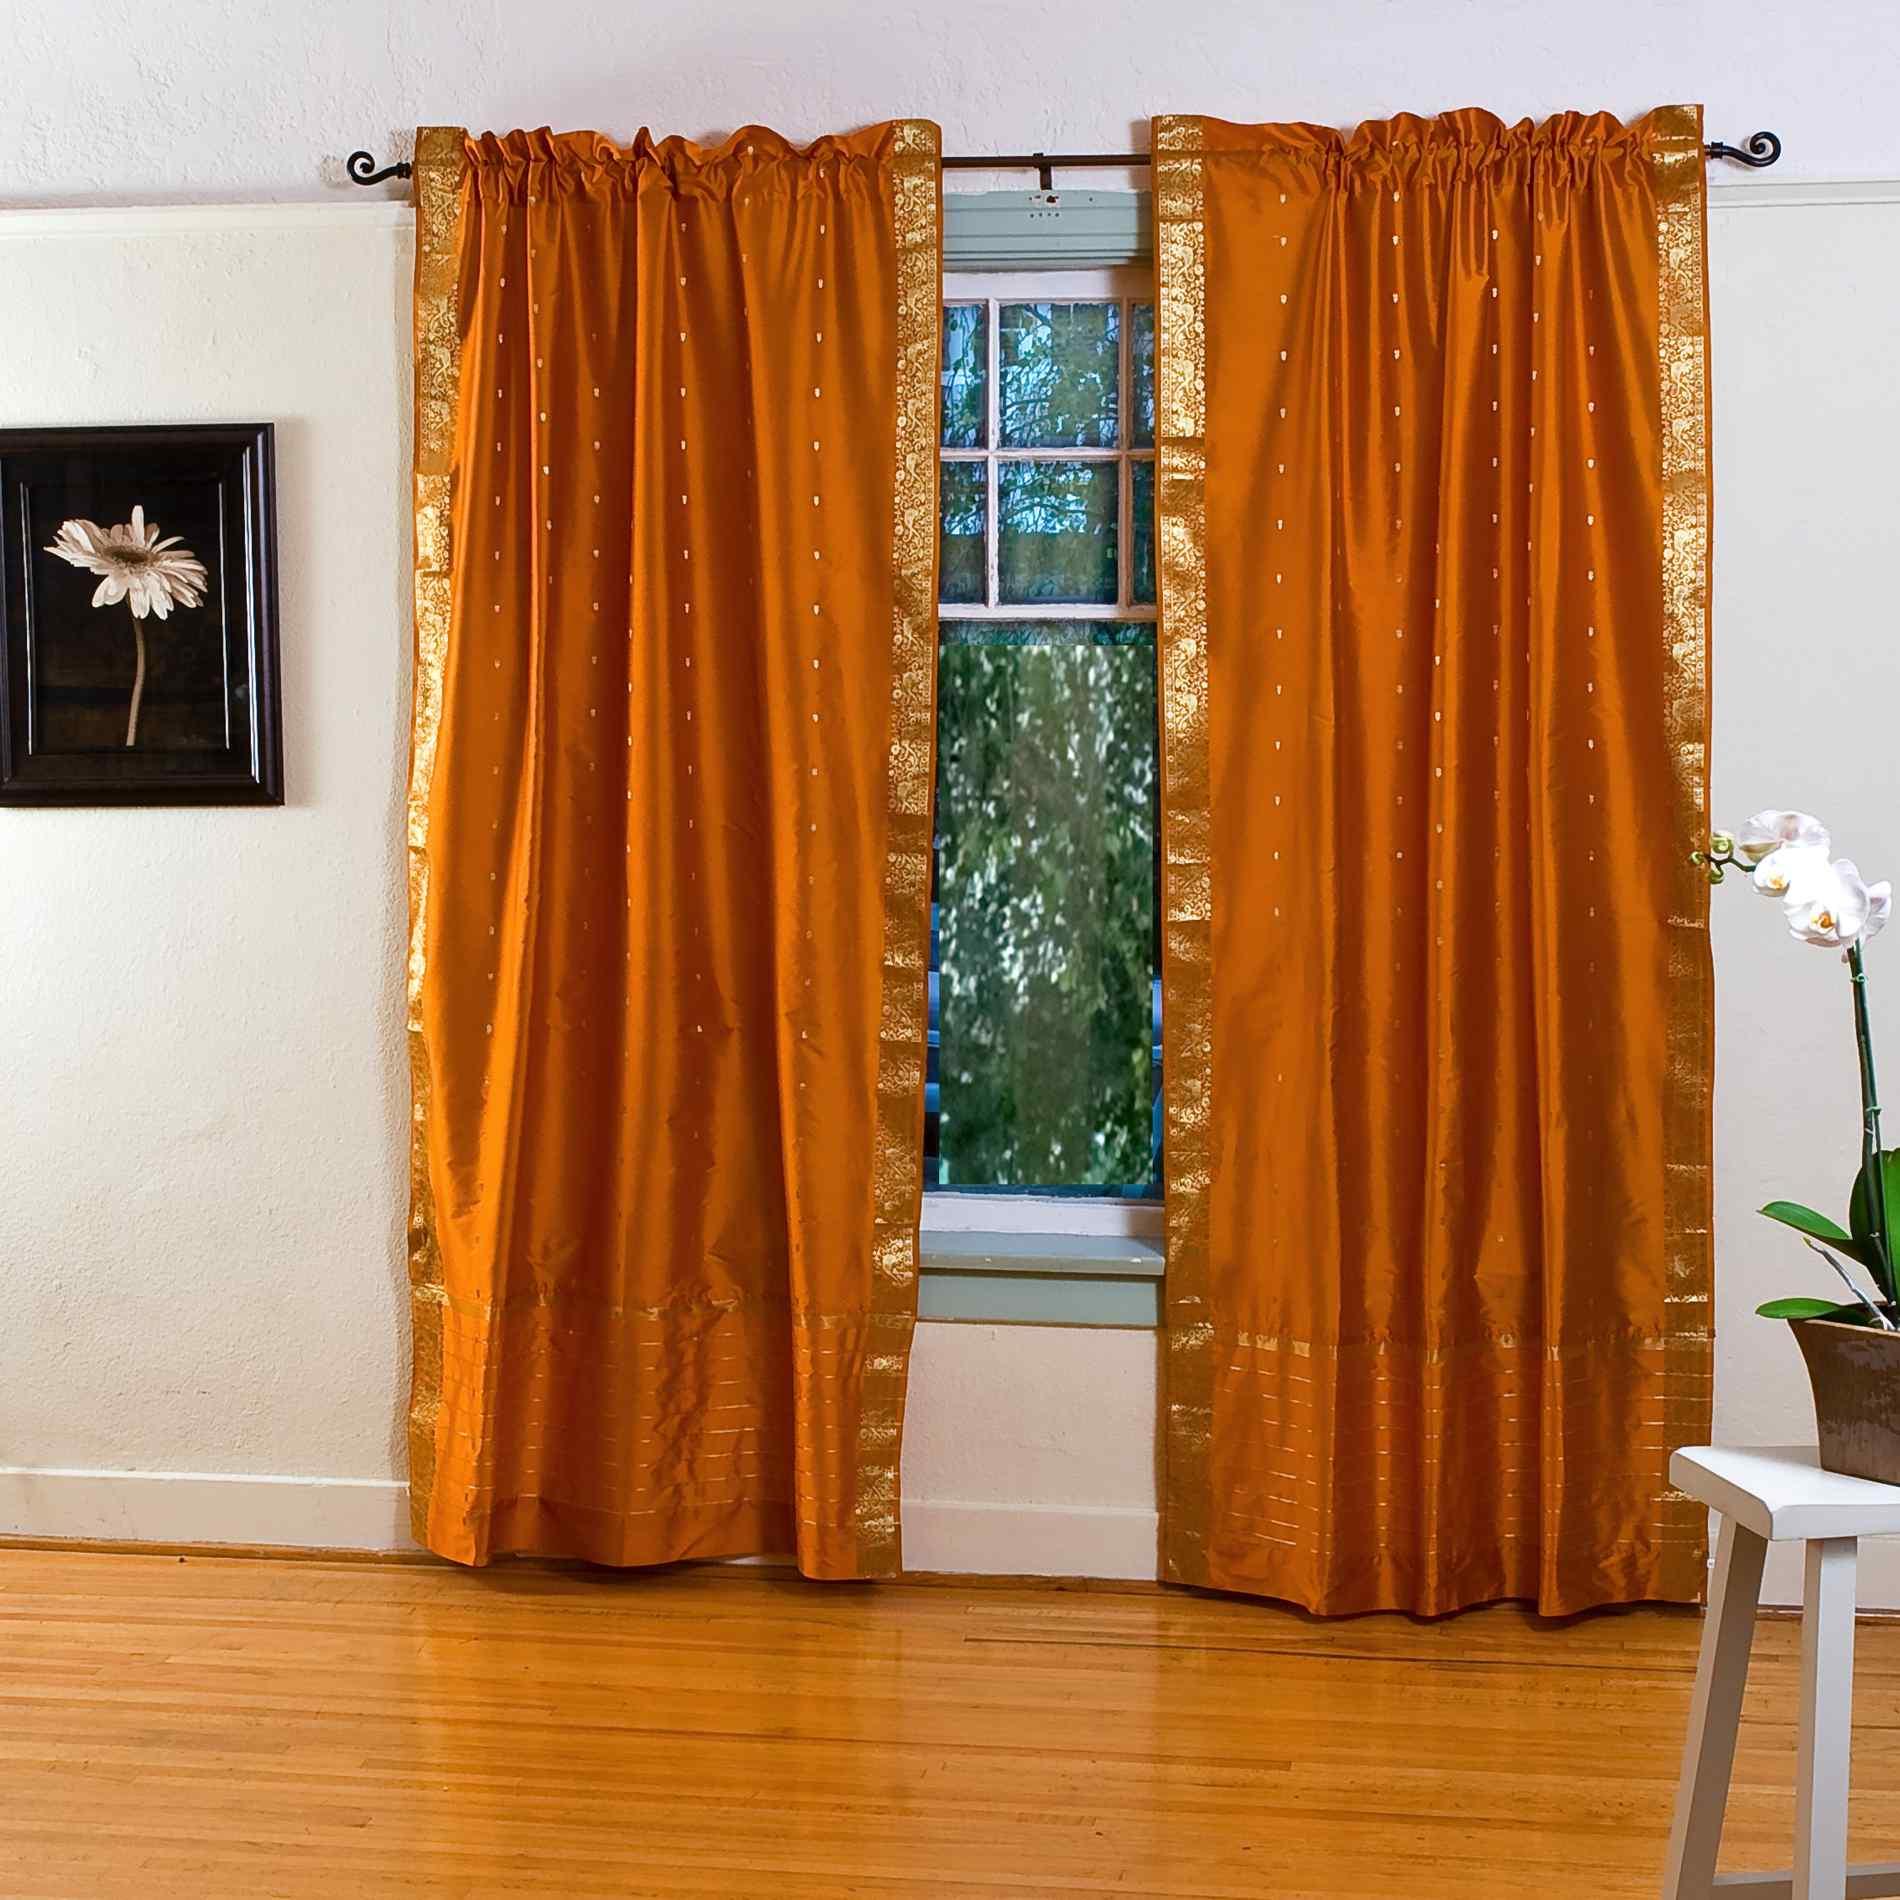 Mustard yellow curtains